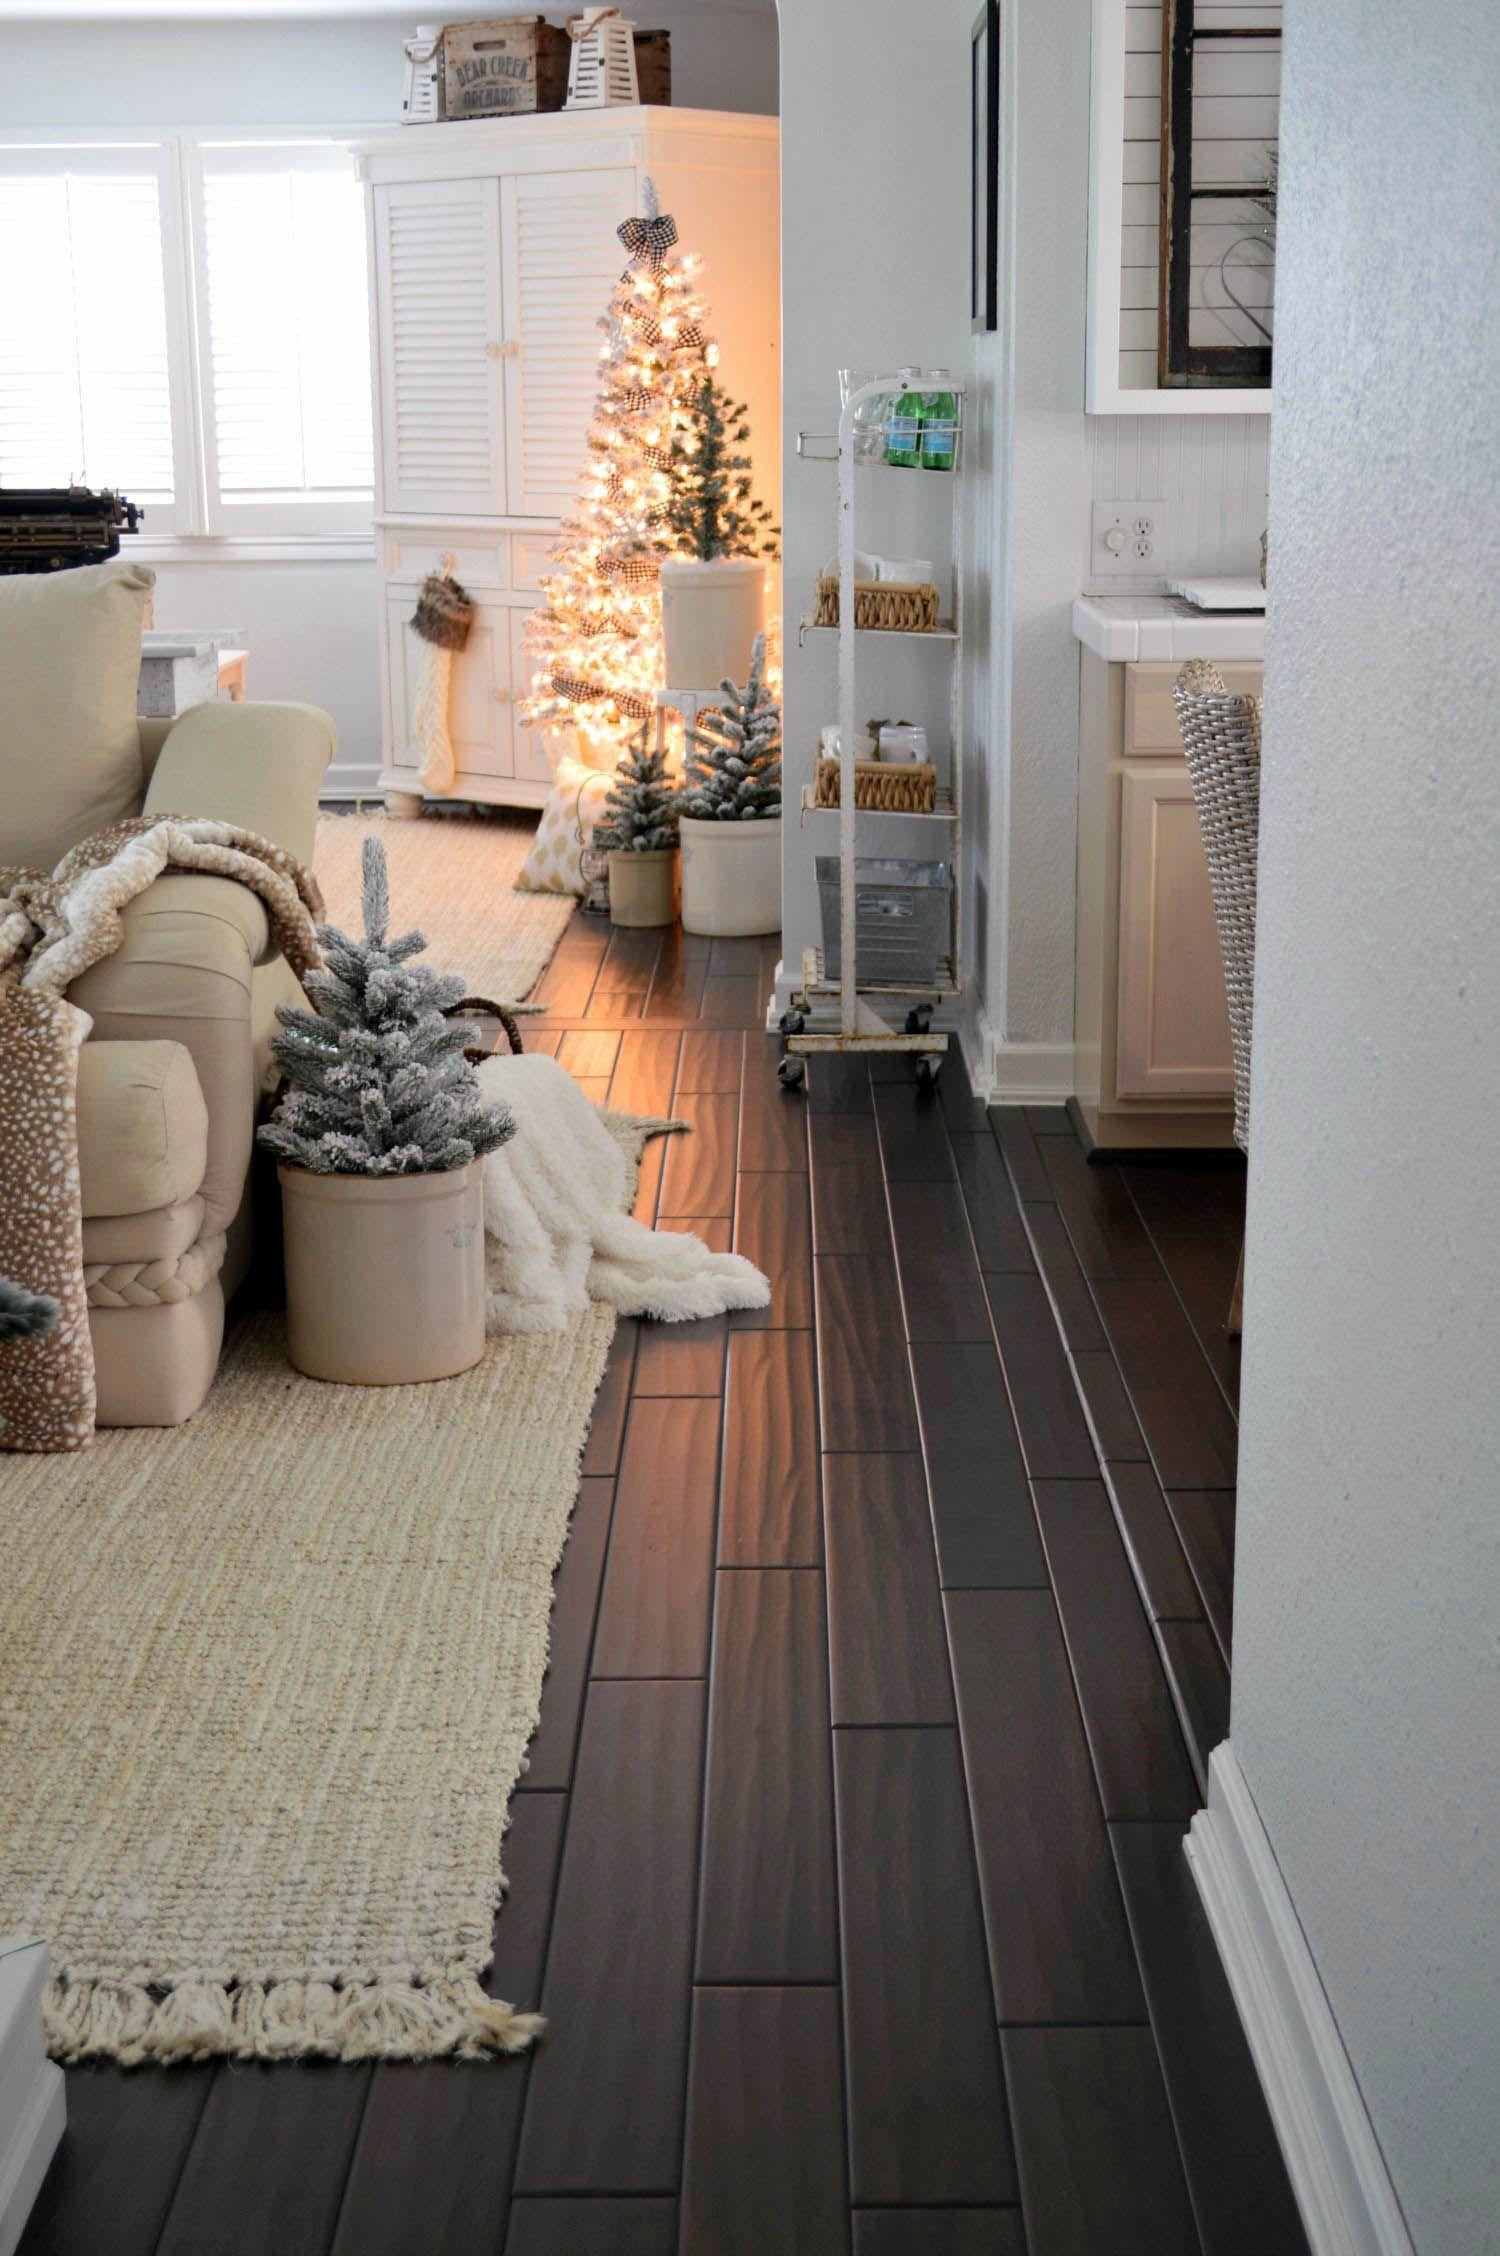 Most Popular Laminate Wood Flooring Carpetright For 2019 Wood Floor Colors Living Room Hardwood Floors Floor Design